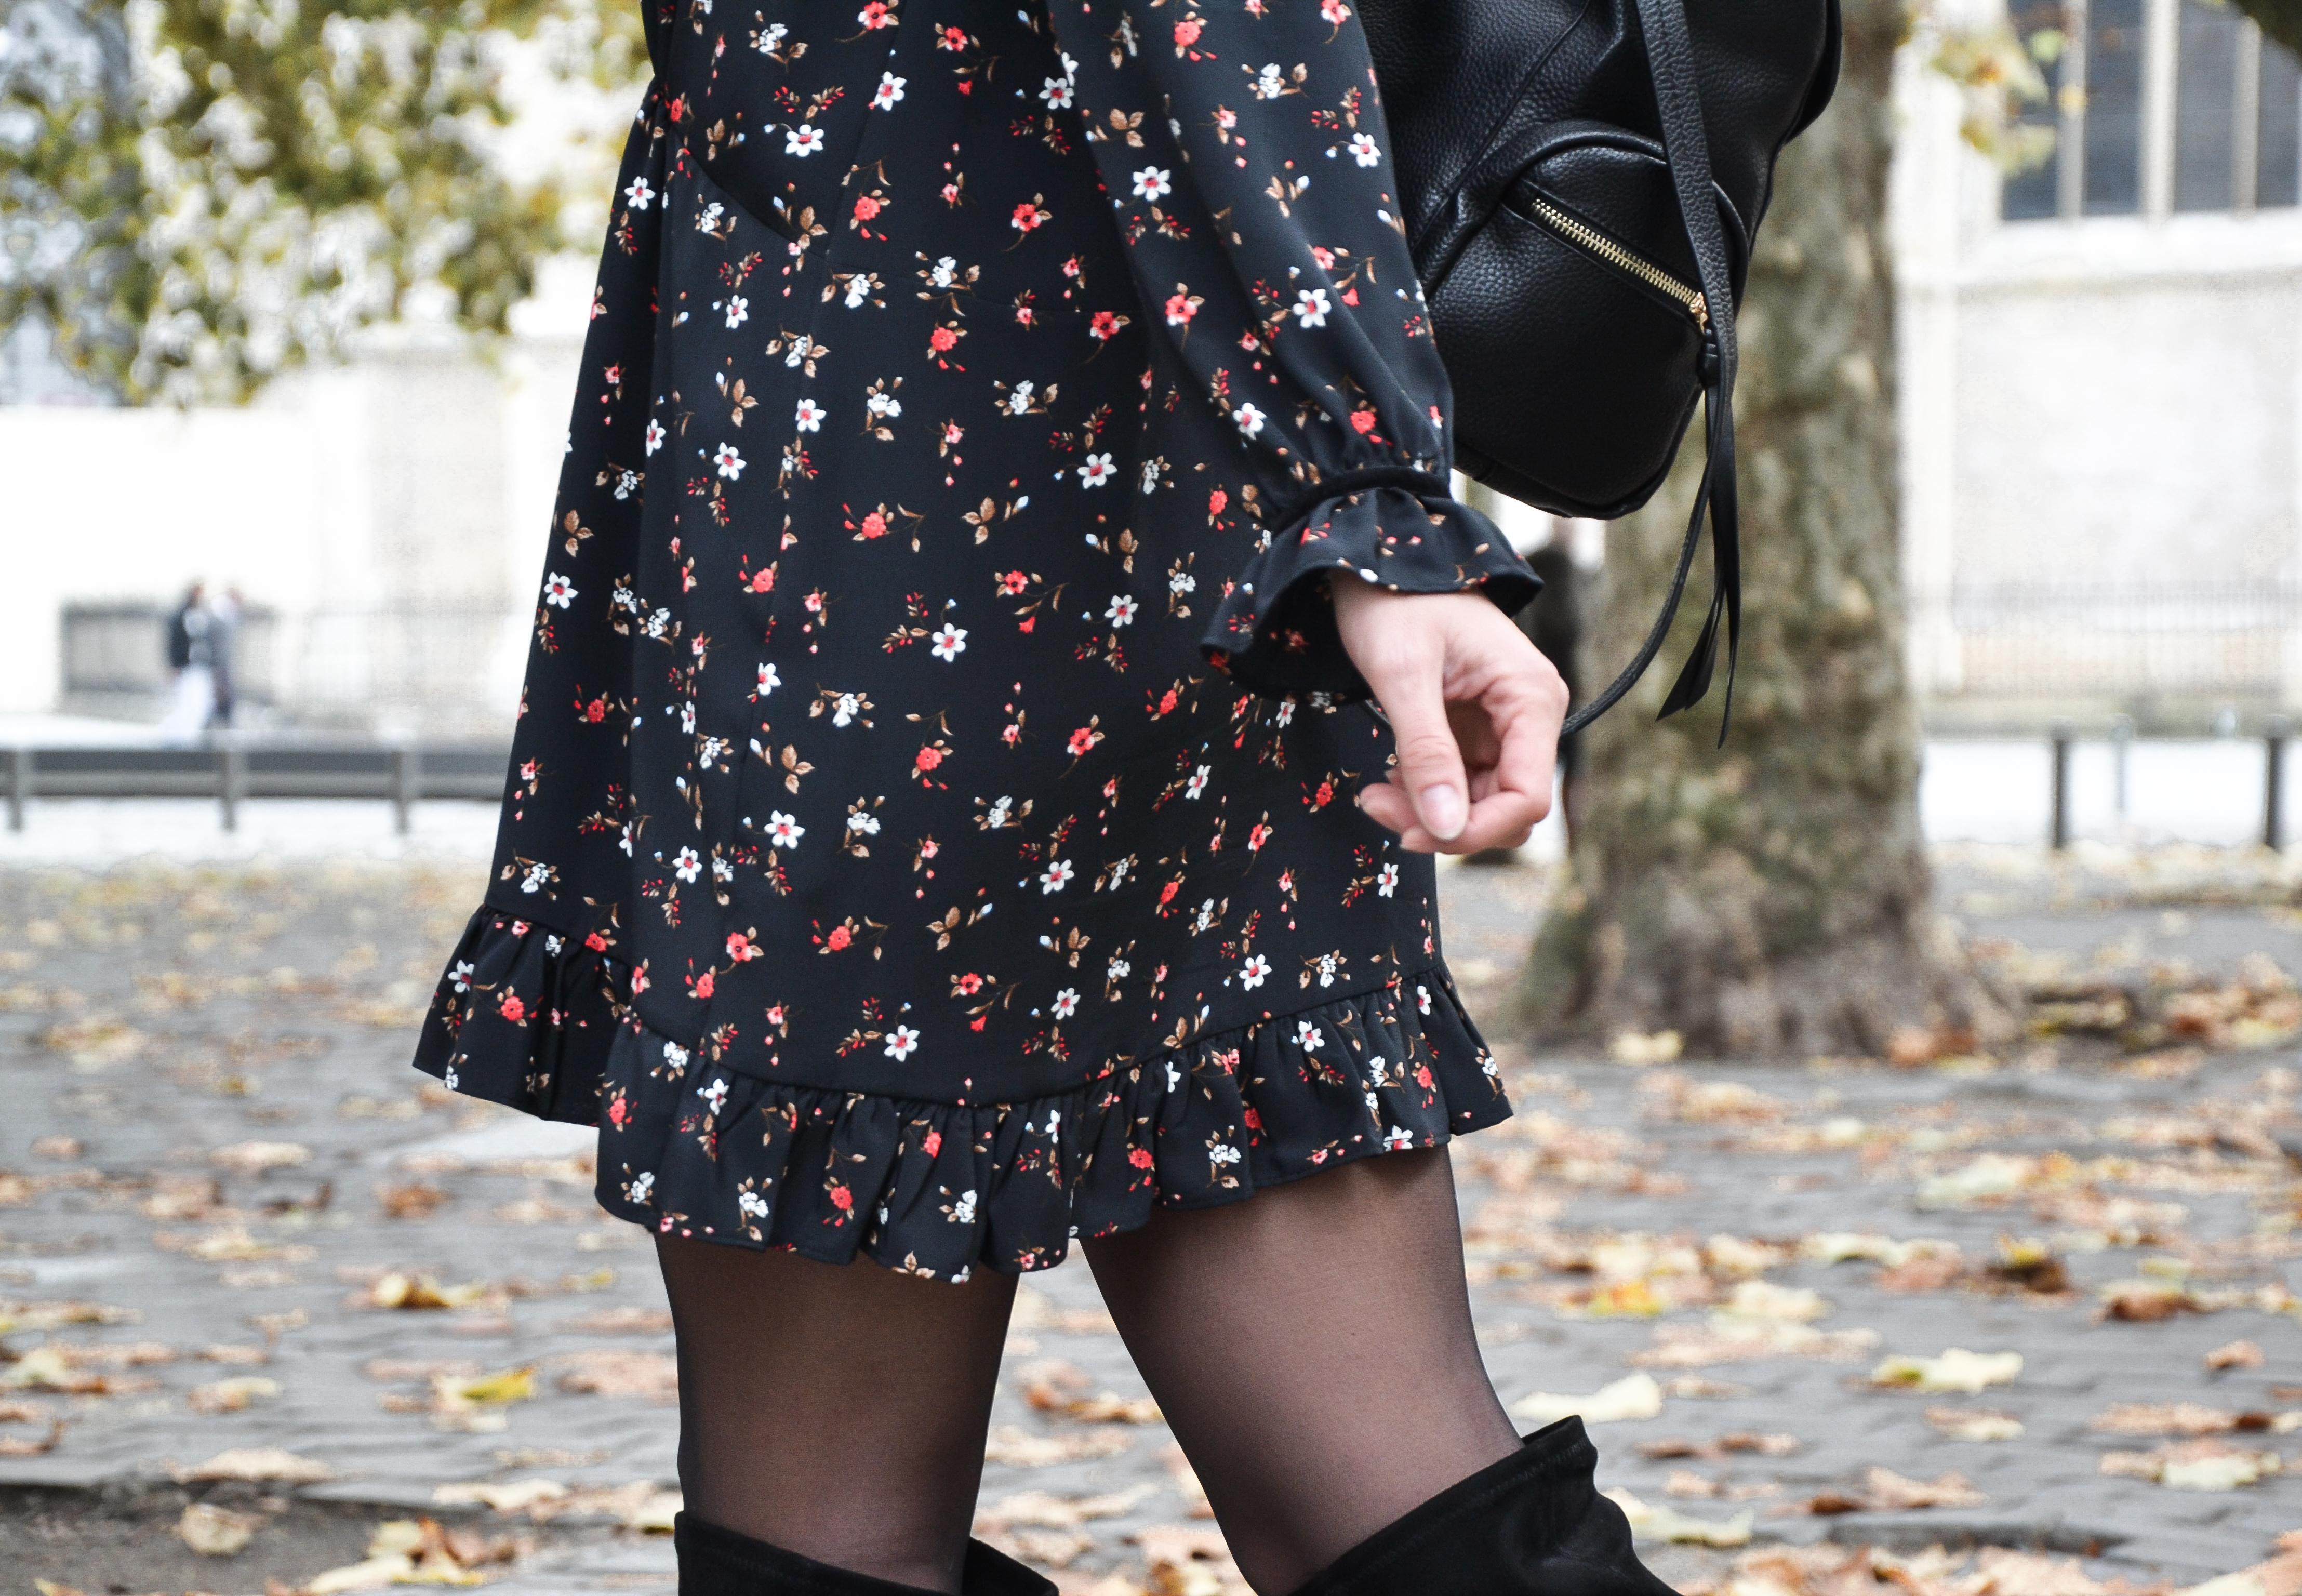 Robe noire fleurie zara